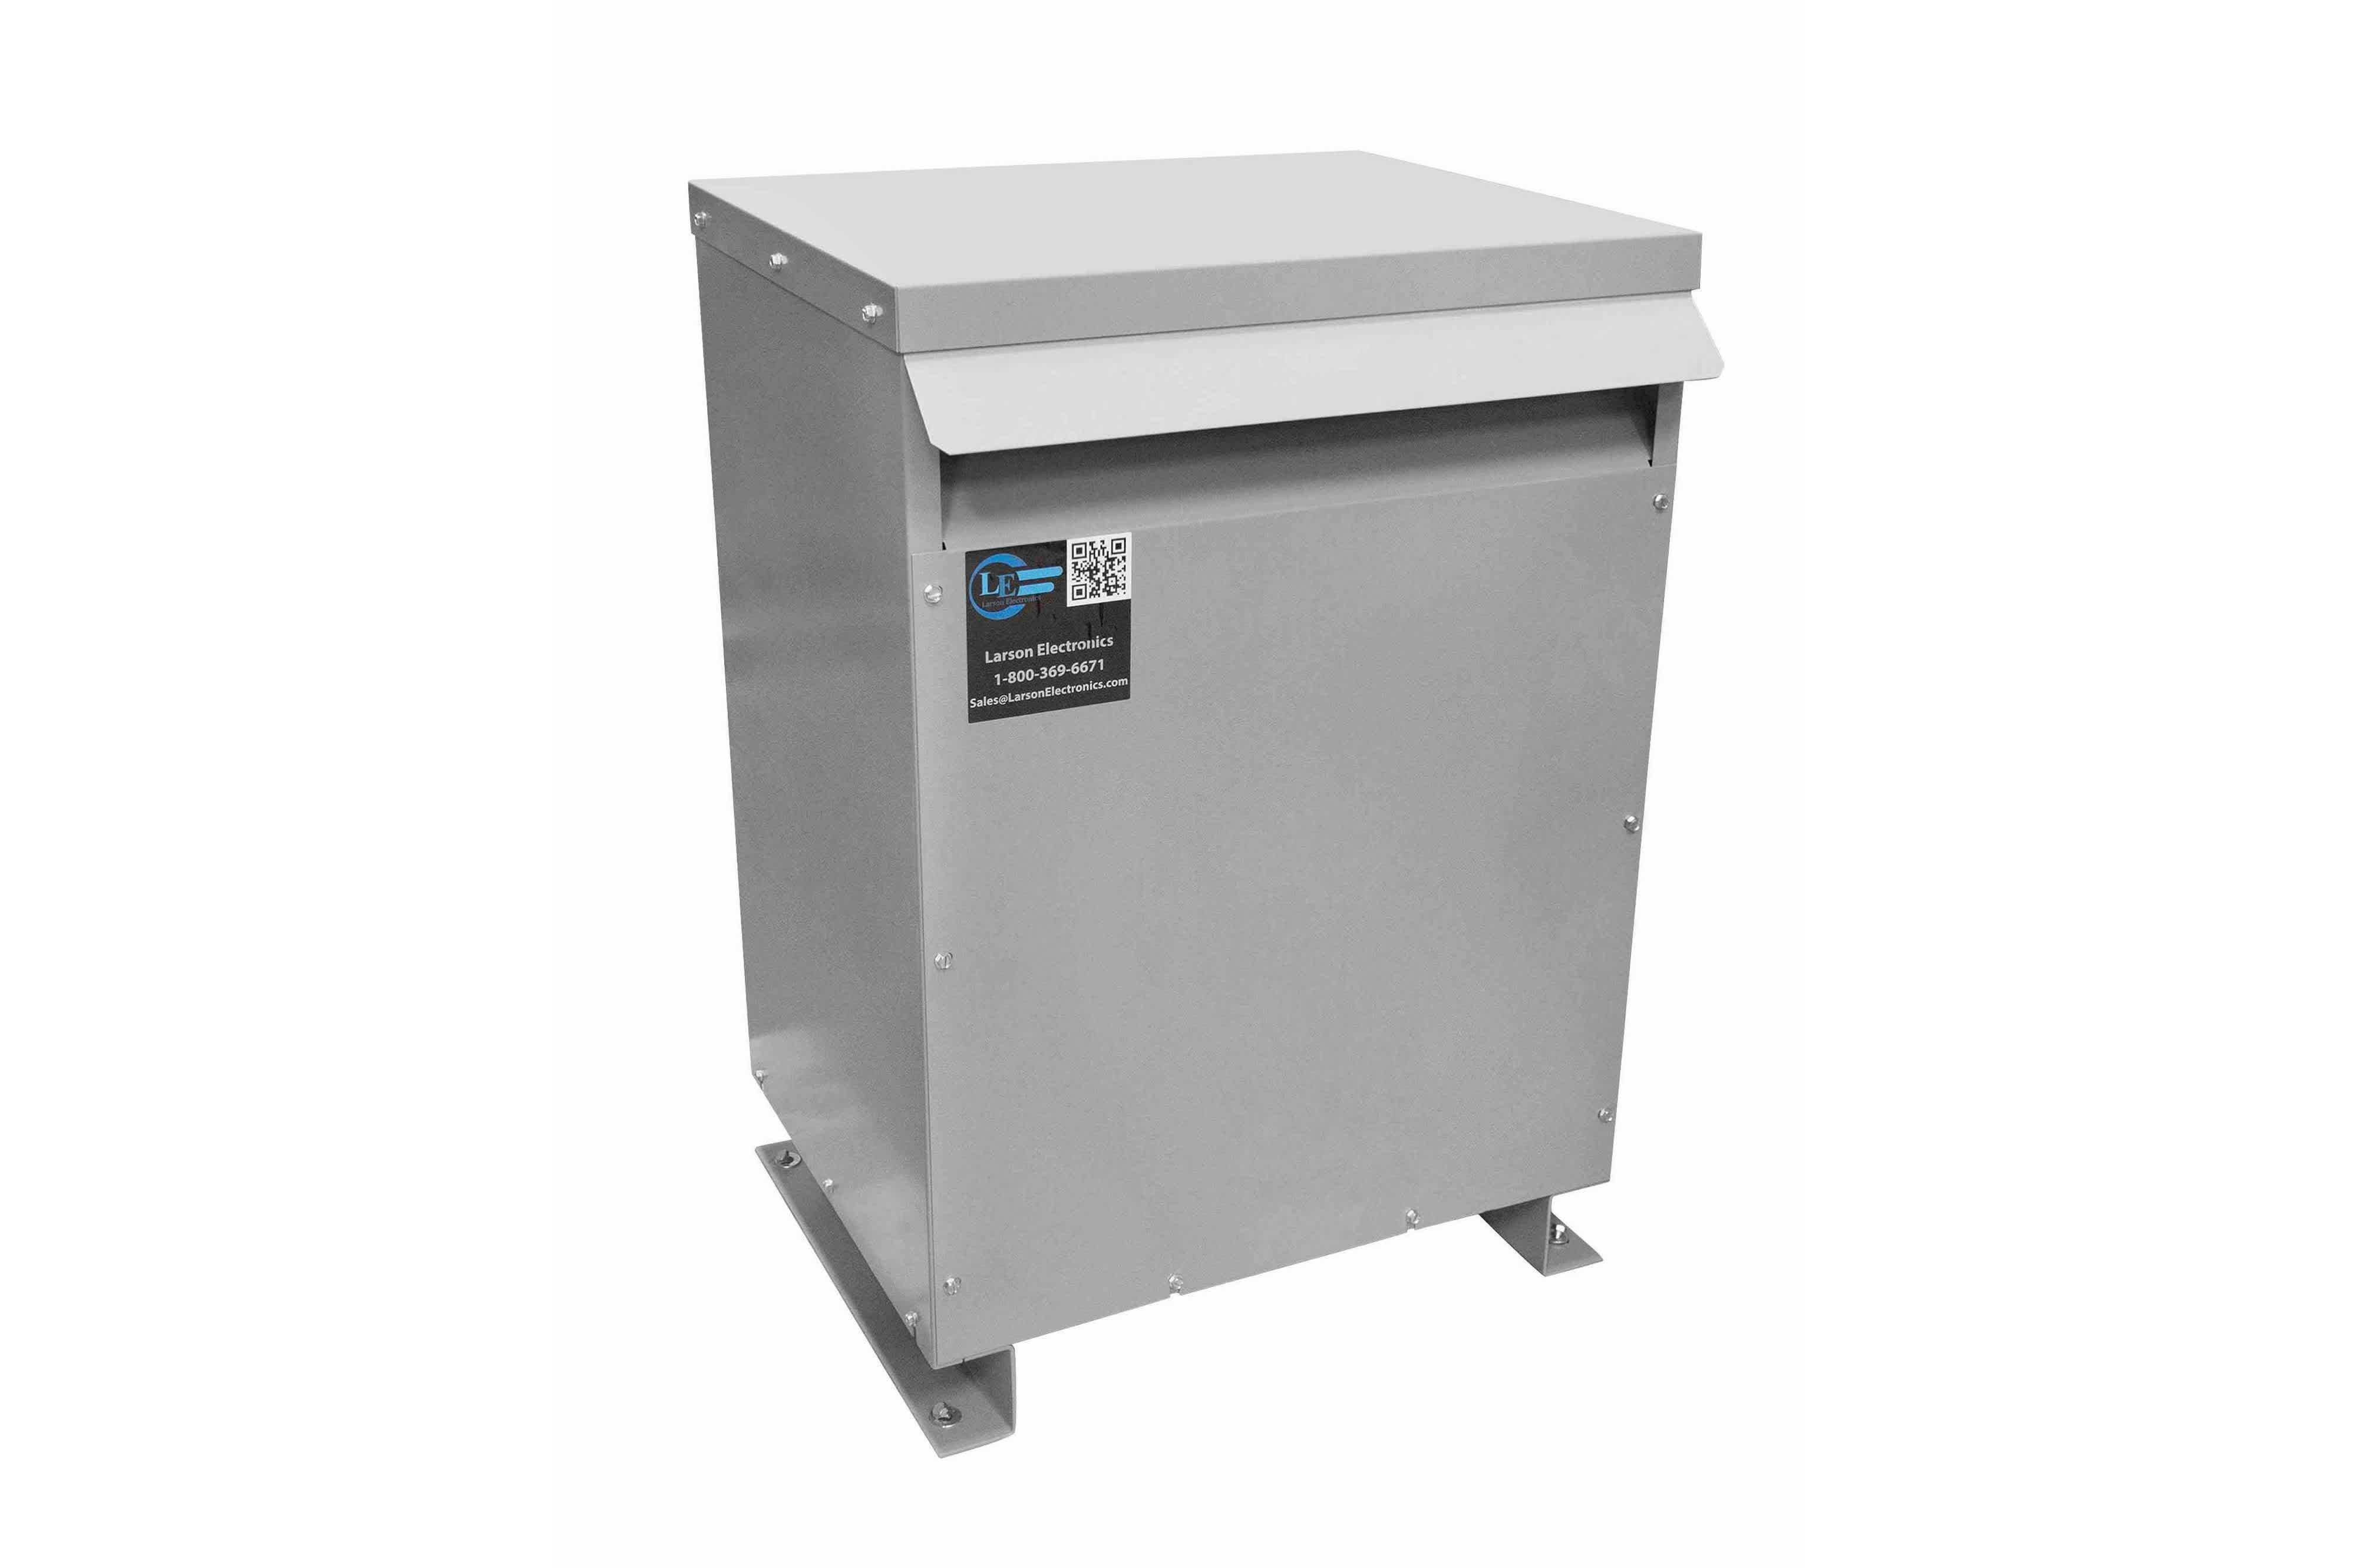 40 kVA 3PH Isolation Transformer, 480V Wye Primary, 380Y/220 Wye-N Secondary, N3R, Ventilated, 60 Hz